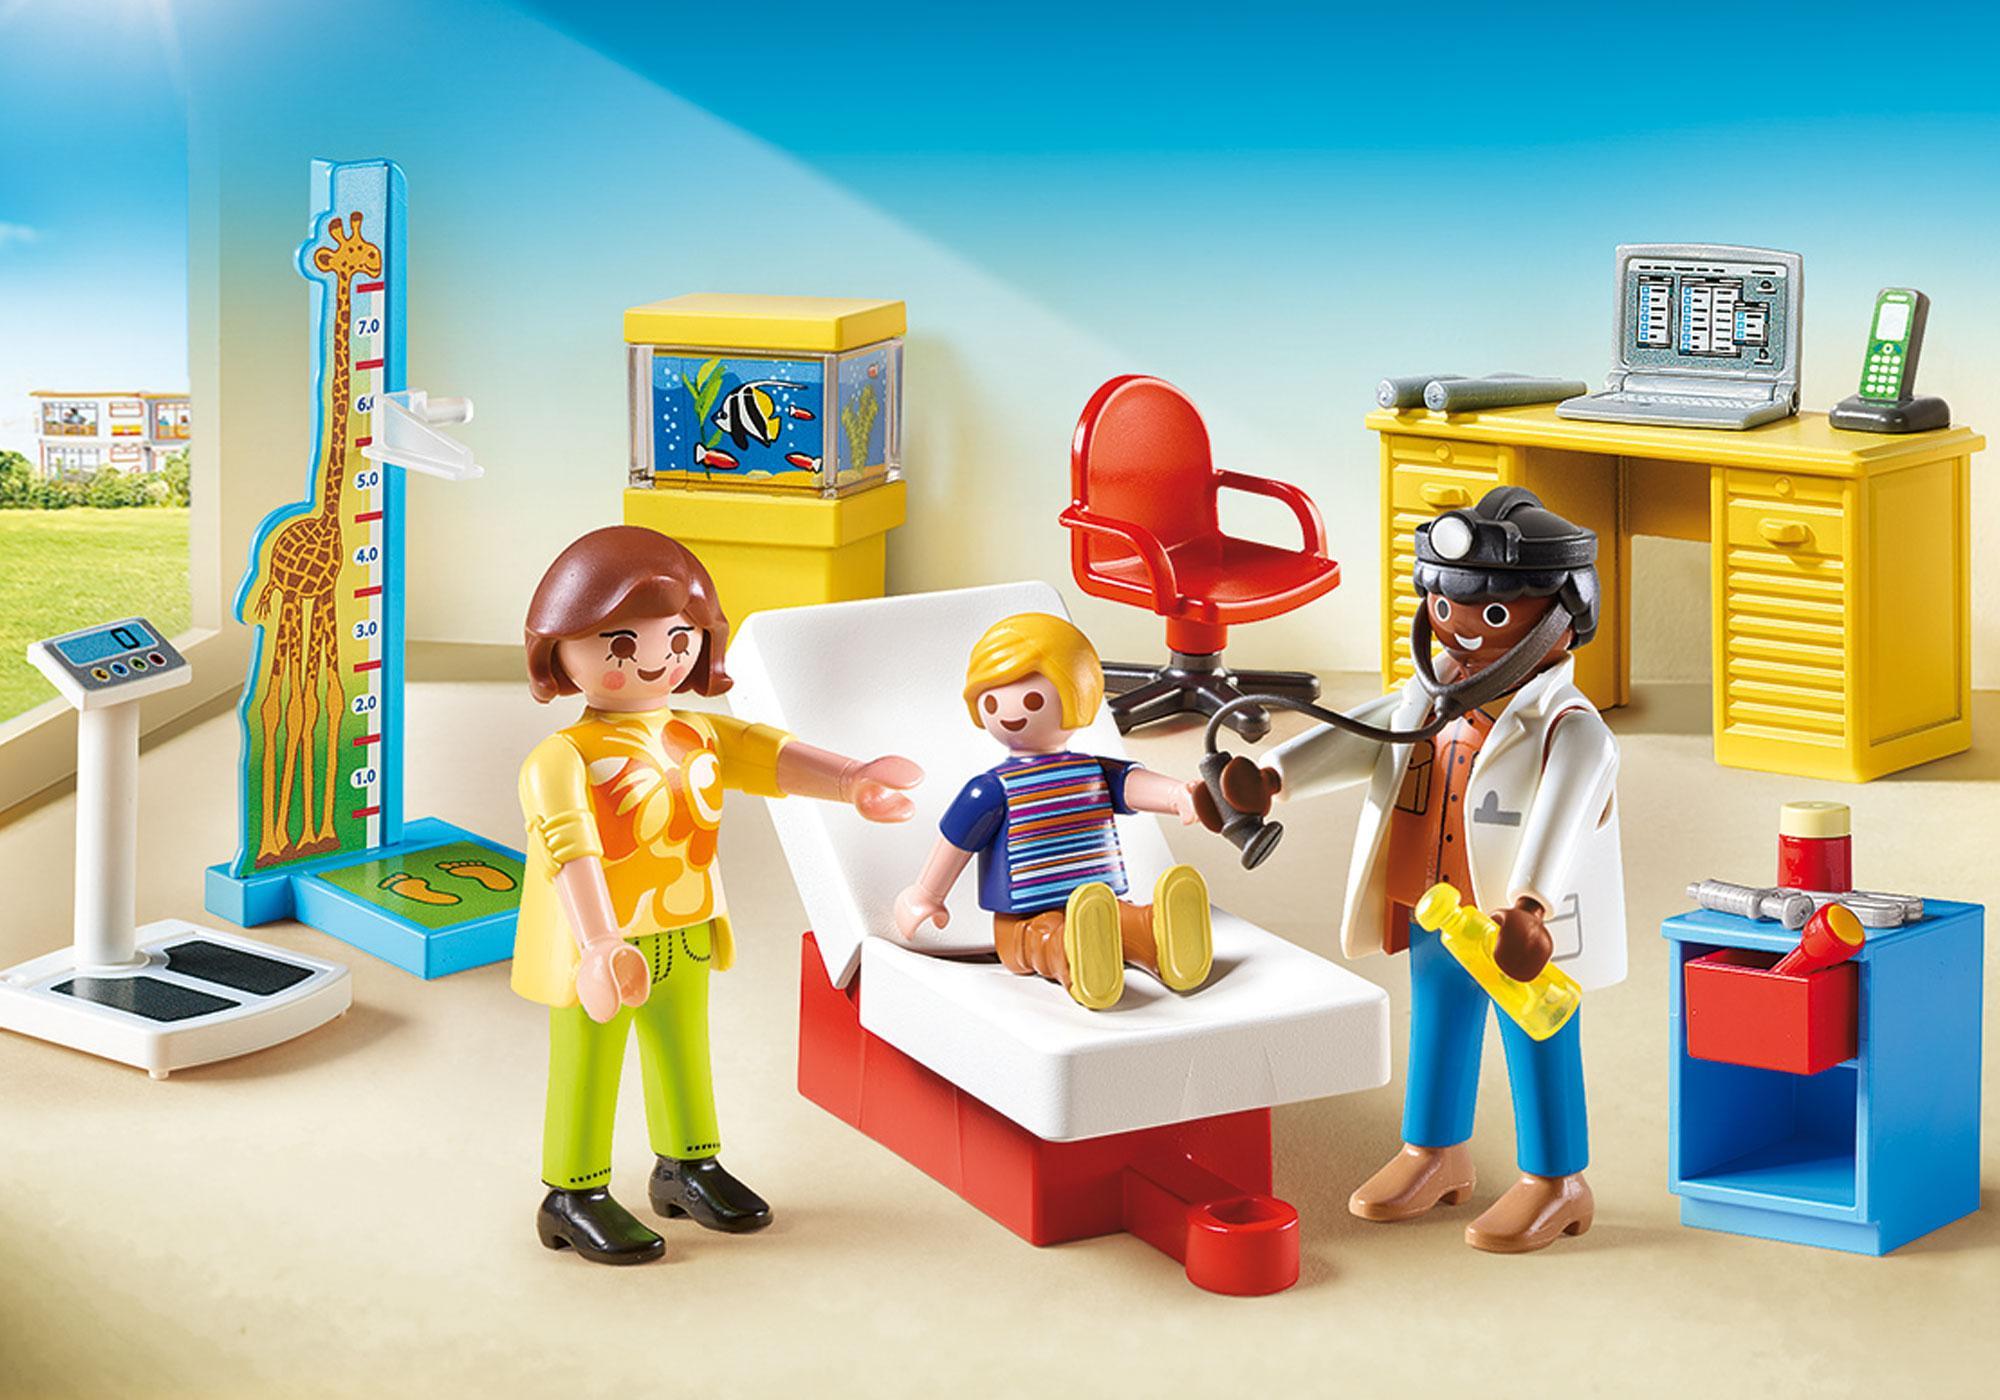 http://media.playmobil.com/i/playmobil/70034_product_detail/StarterPack Bij de kinderarts